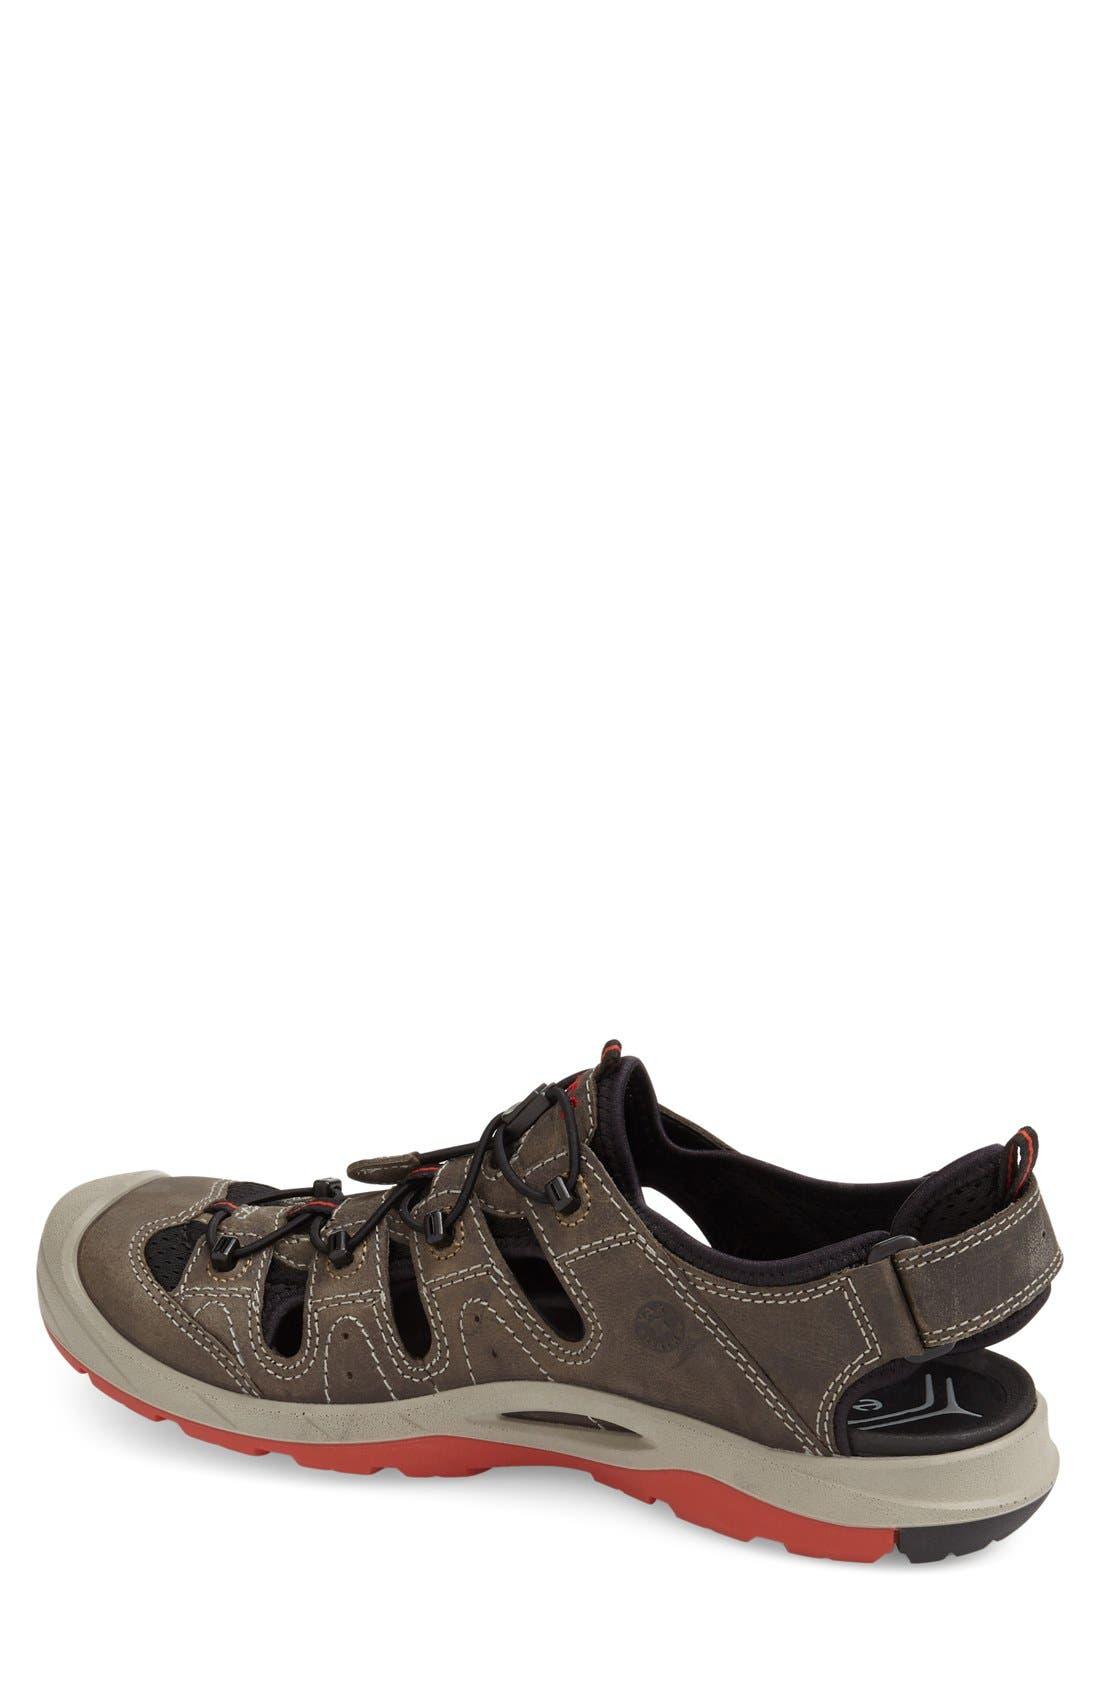 'BIOM Delta Offroad' Sandal,                             Alternate thumbnail 6, color,